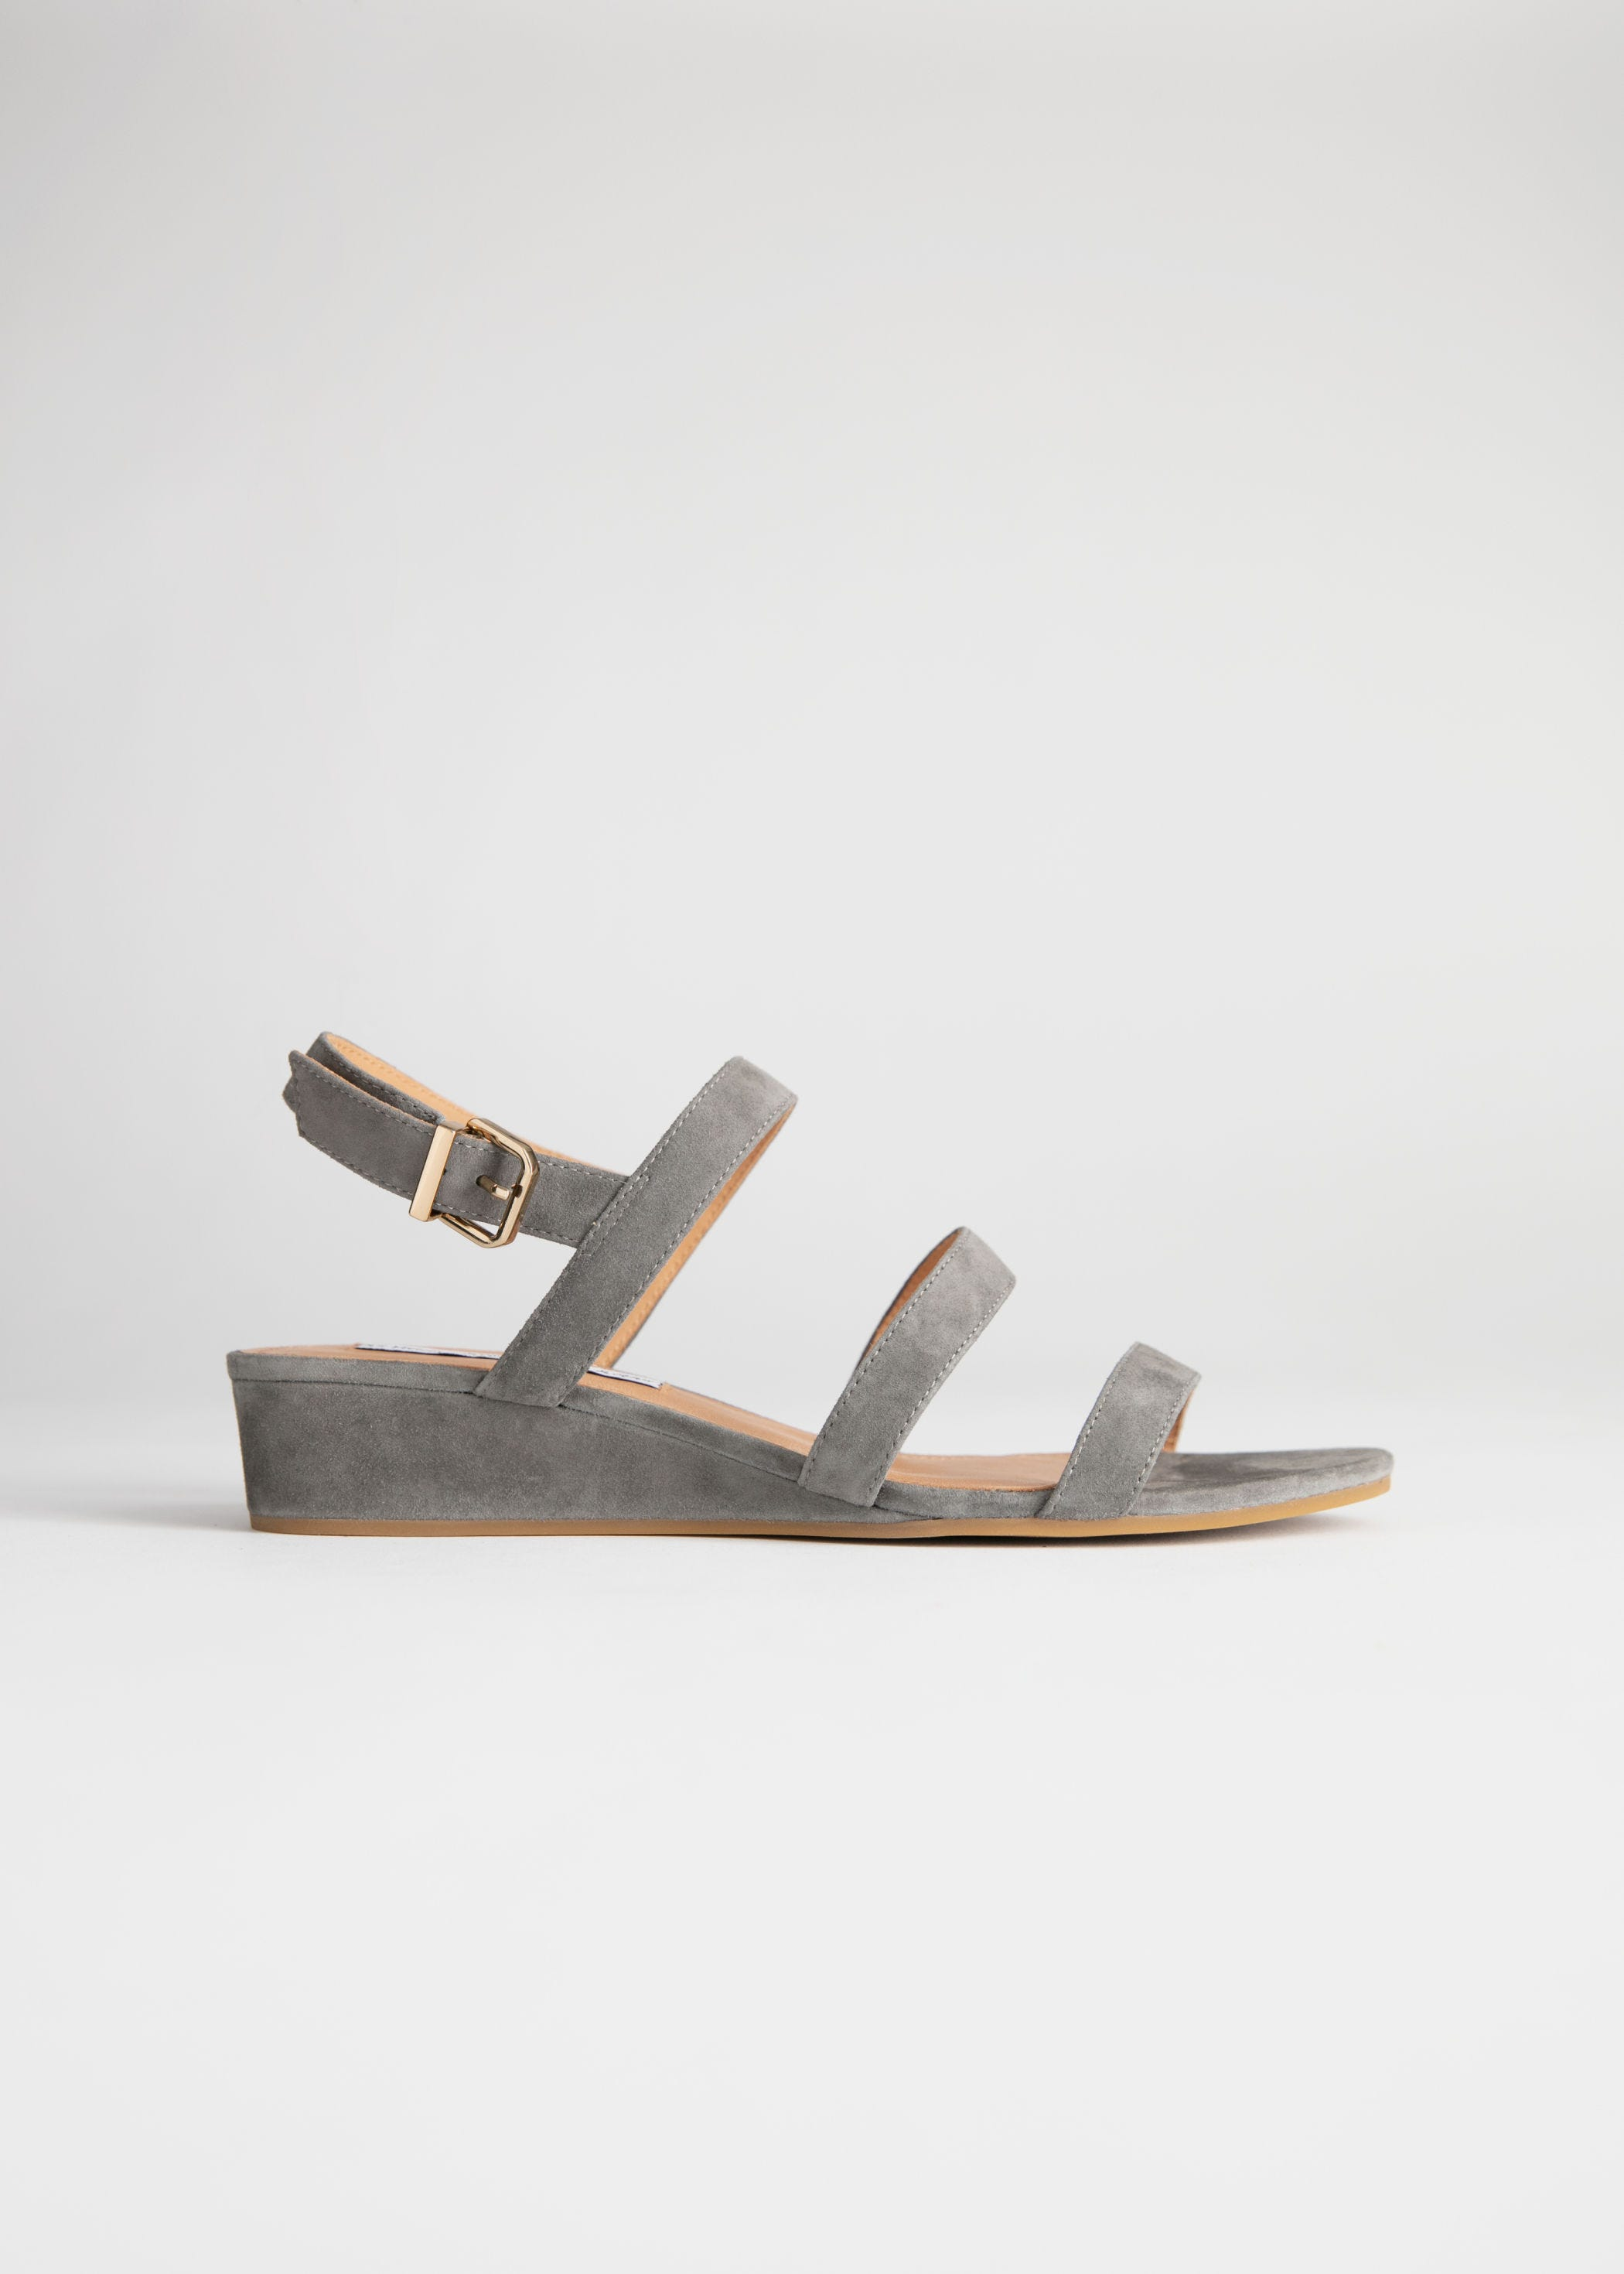 fab0cde8eafd Everlane Wedge Sandal - Affordable